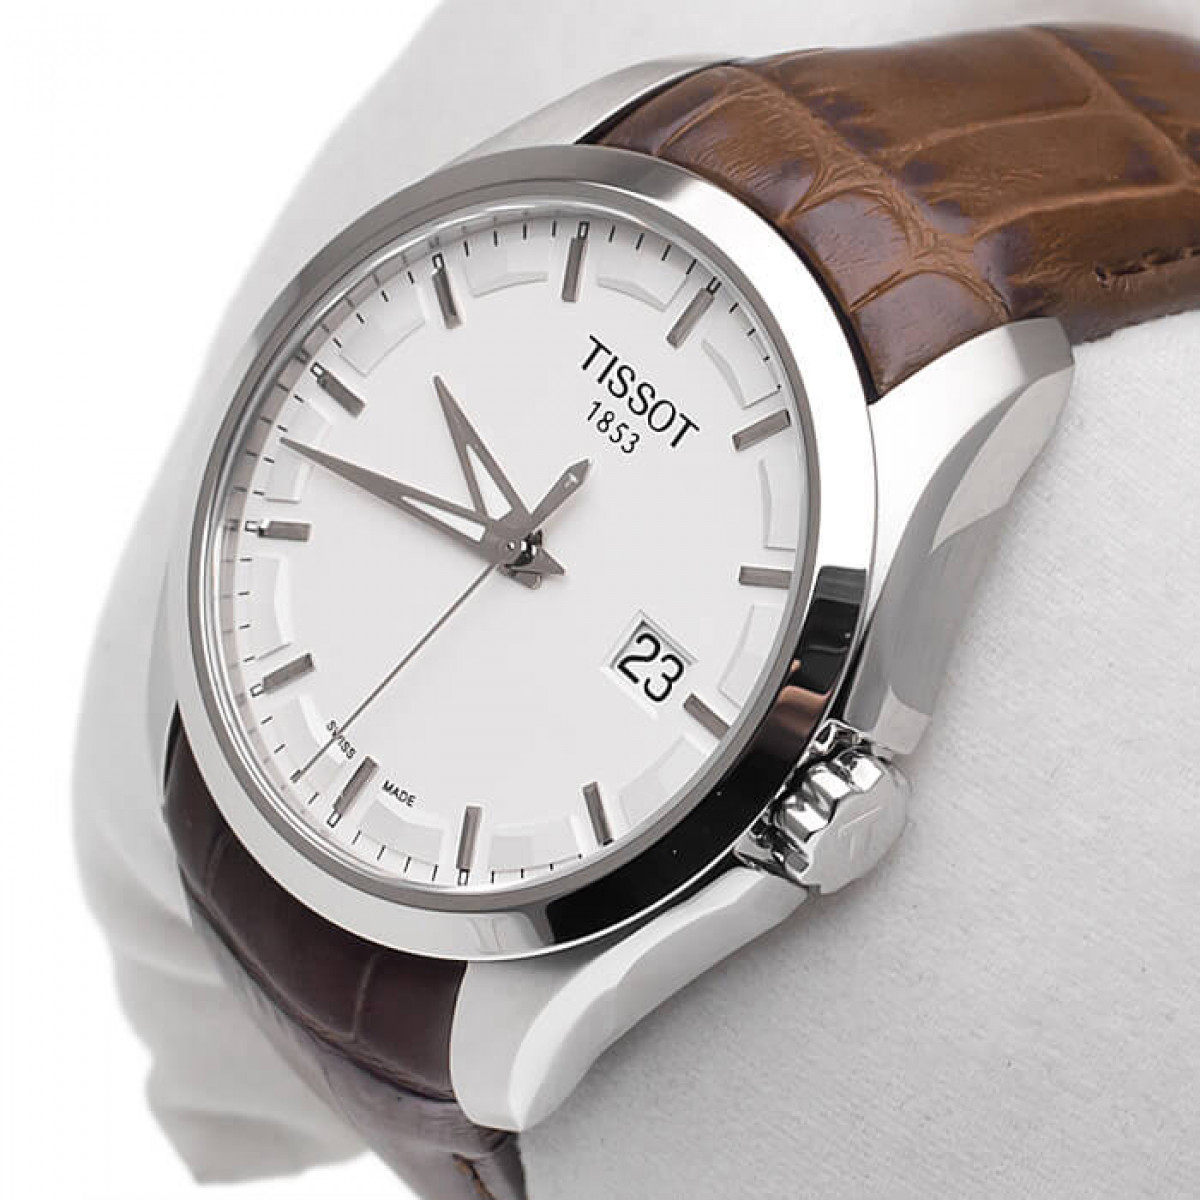 Часовник Tissot T035.410.16.031.00